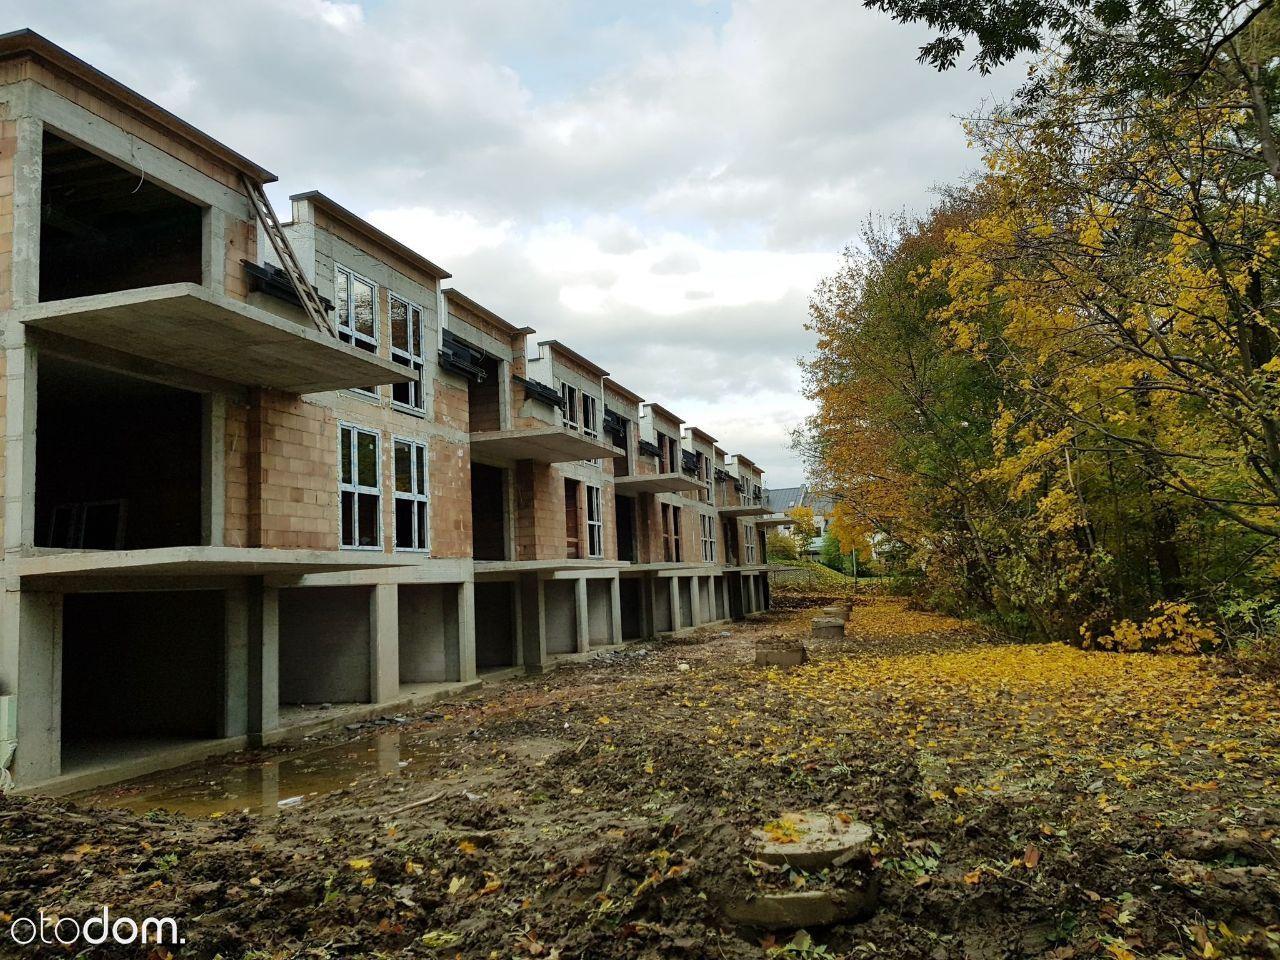 Apartament - 88,44 mkw. - 5 pokoi - Kamienica